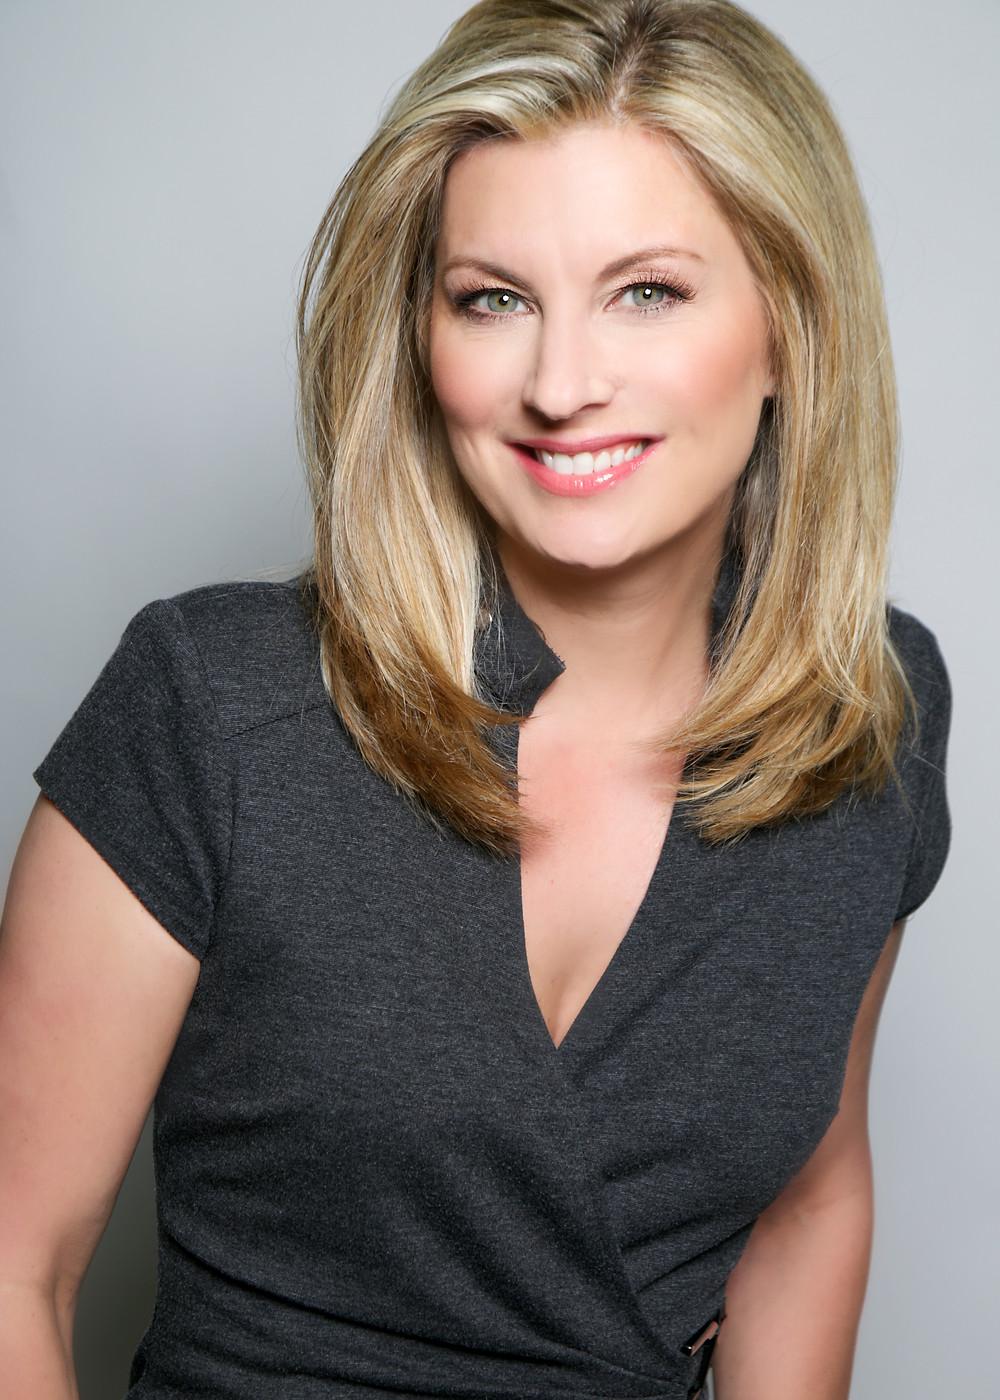 Kim Parrish